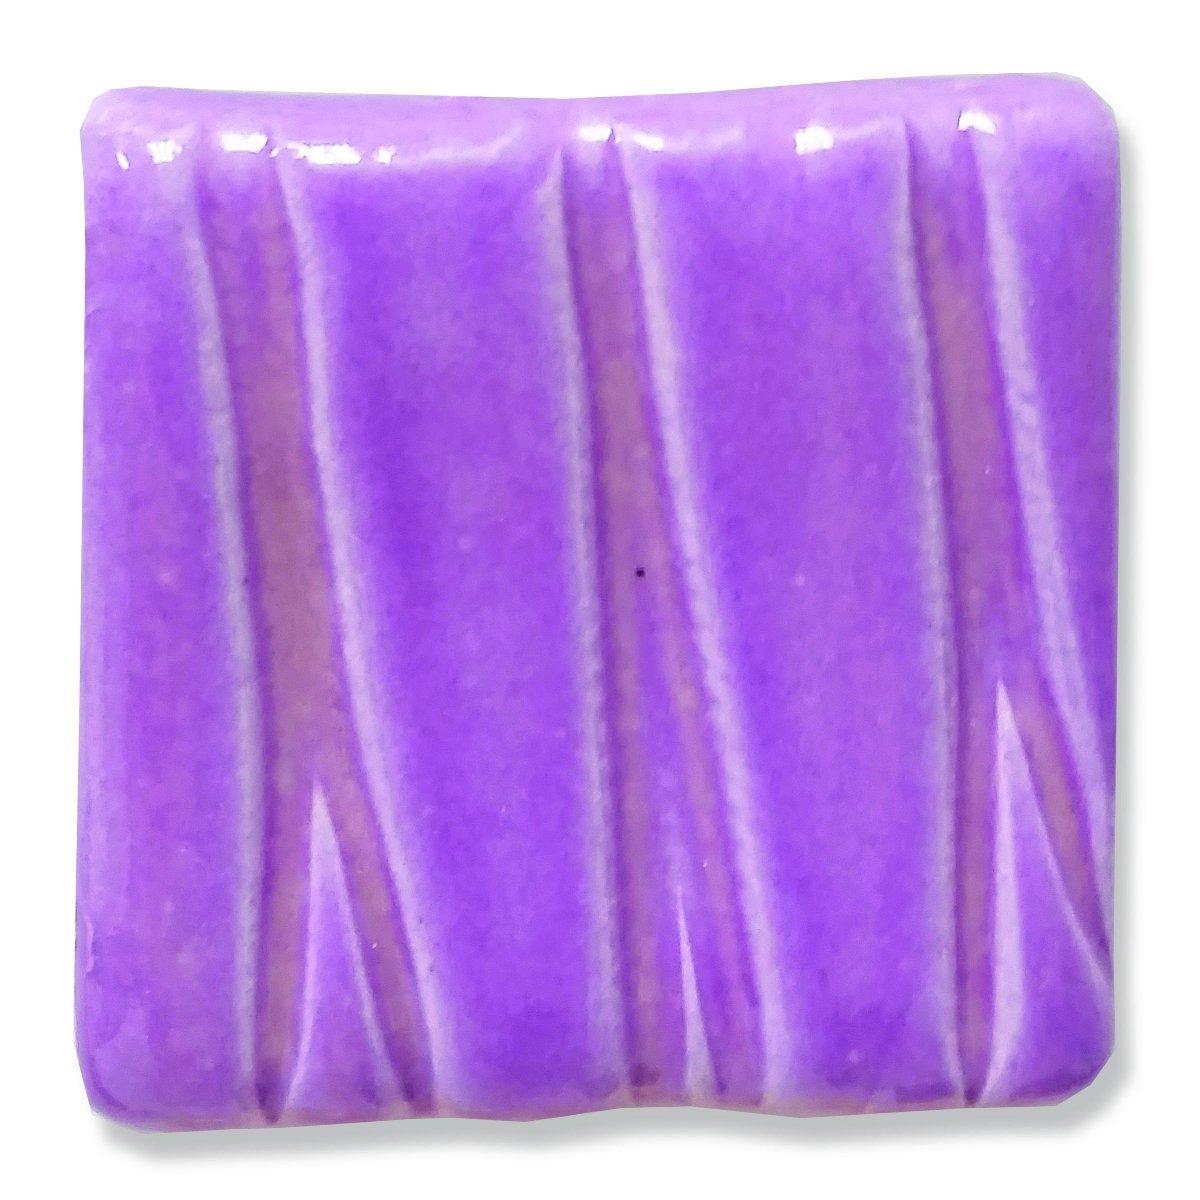 Speedball Art 16 oz. (pint) Earthenware Glaze--Violet